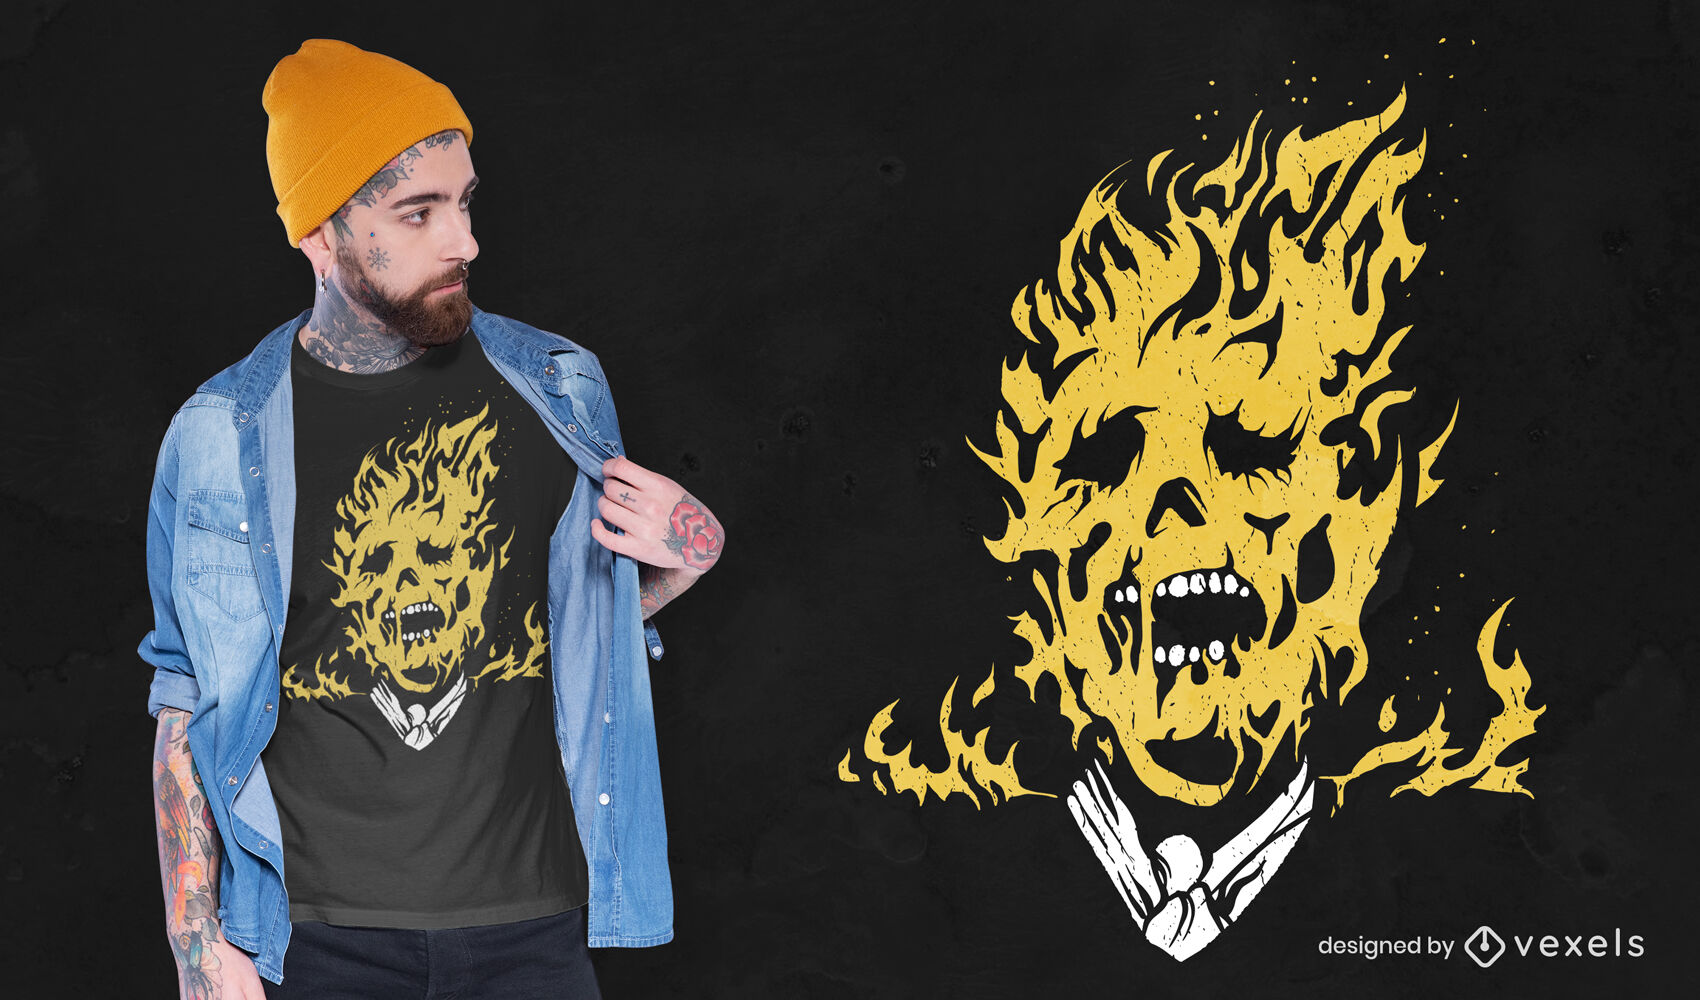 Burning man on fire t-shirt design